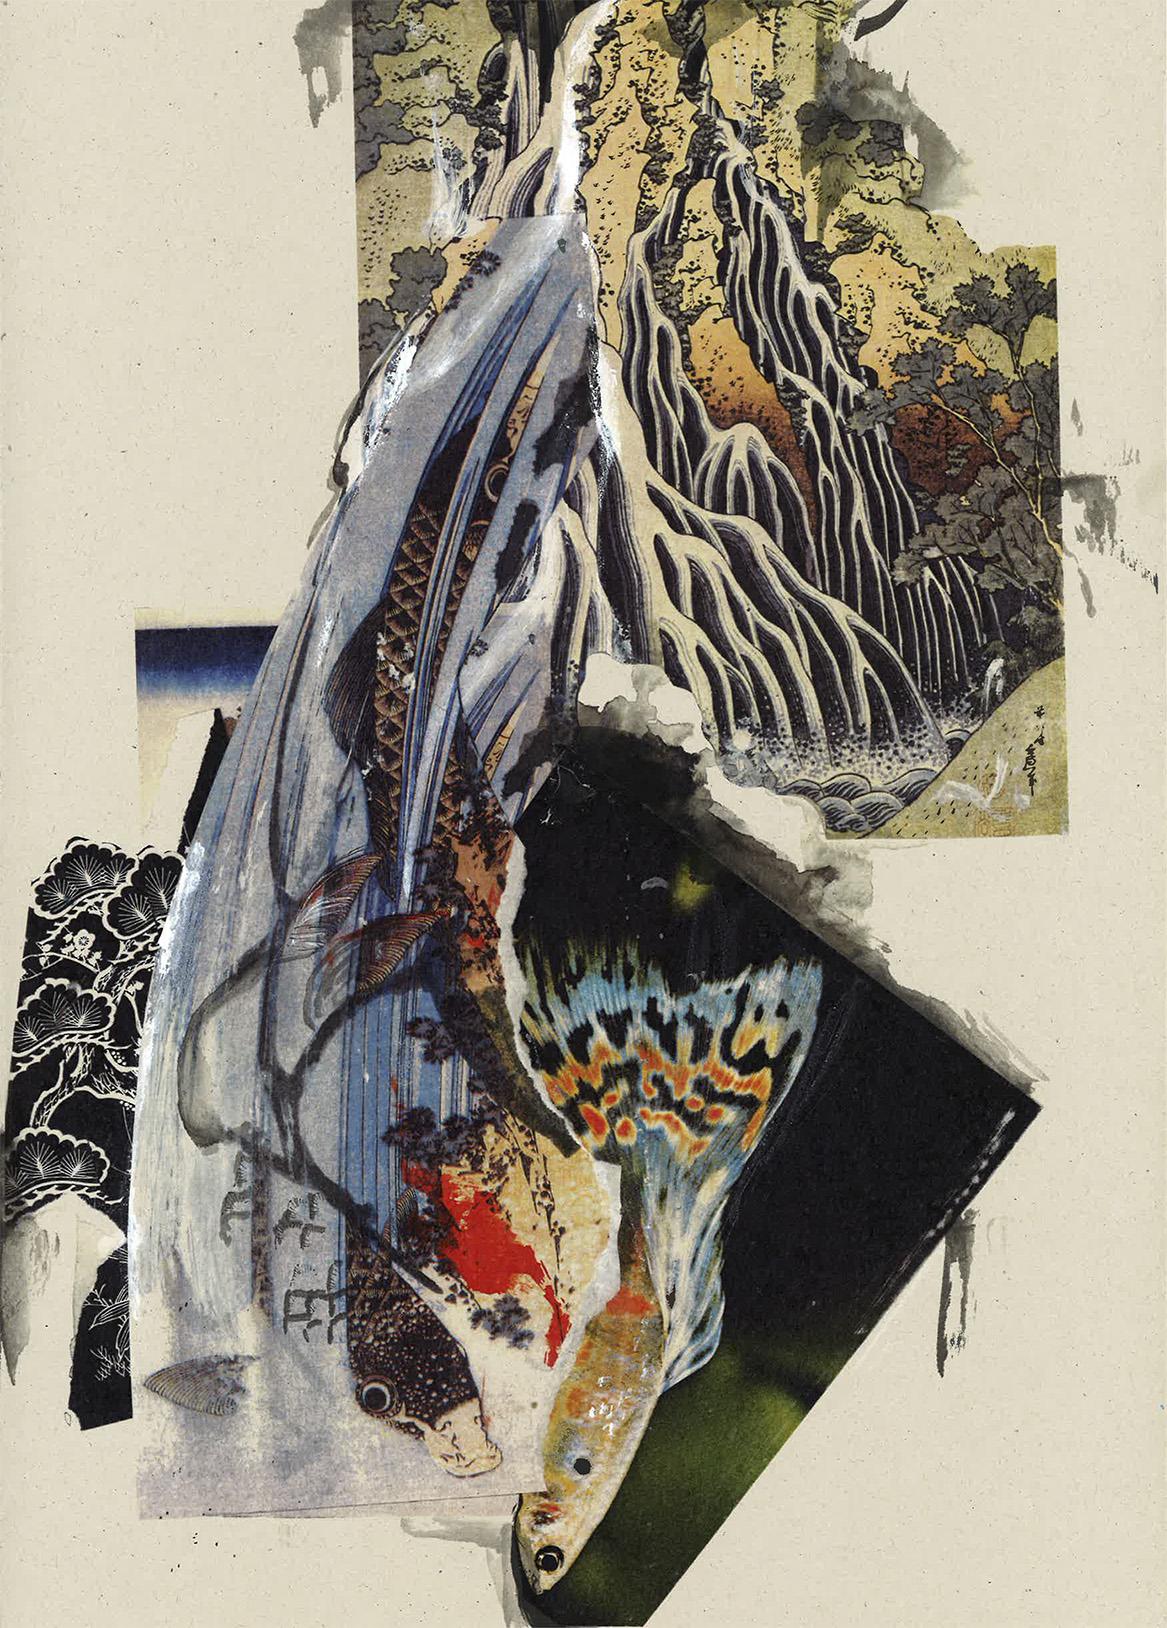 ukiyoe-fish-koi-waterfall-collage-Olivia Suguri.jpg